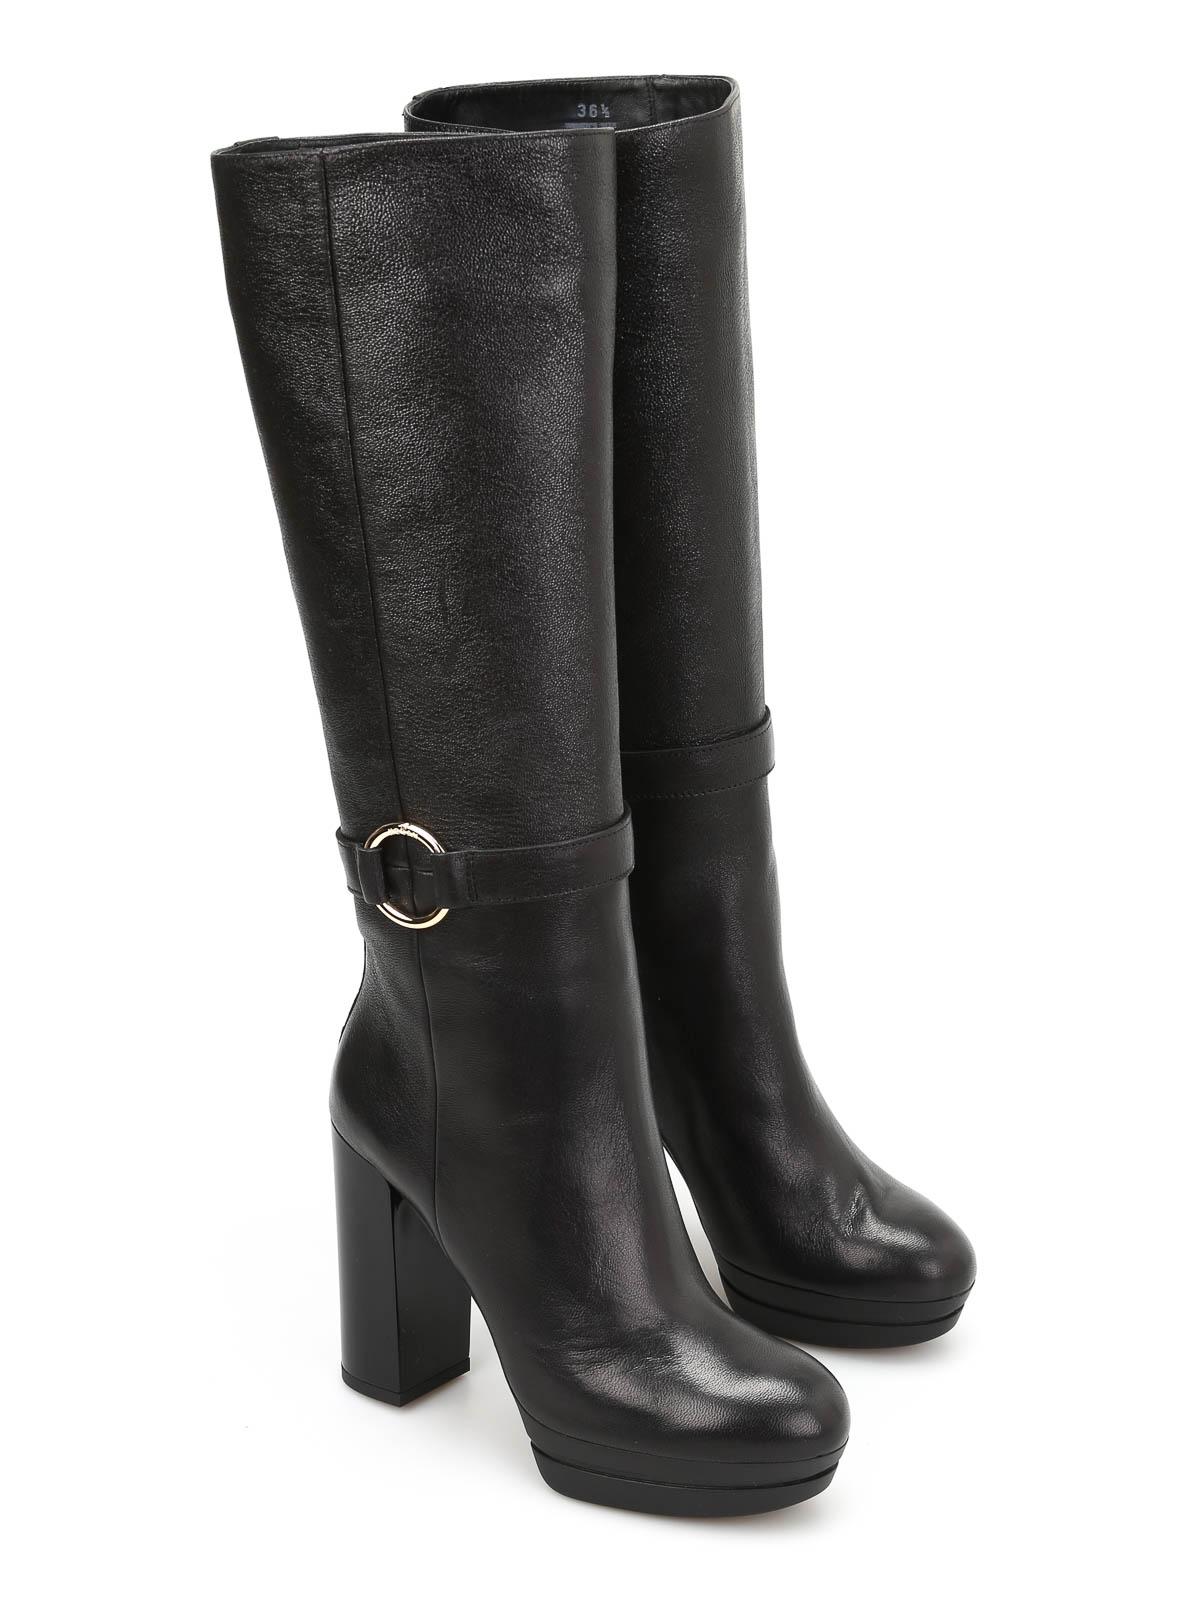 Boots Hogan - H299 Opty leather boots - HXW2990W070DS8B999 | iKRIX.com